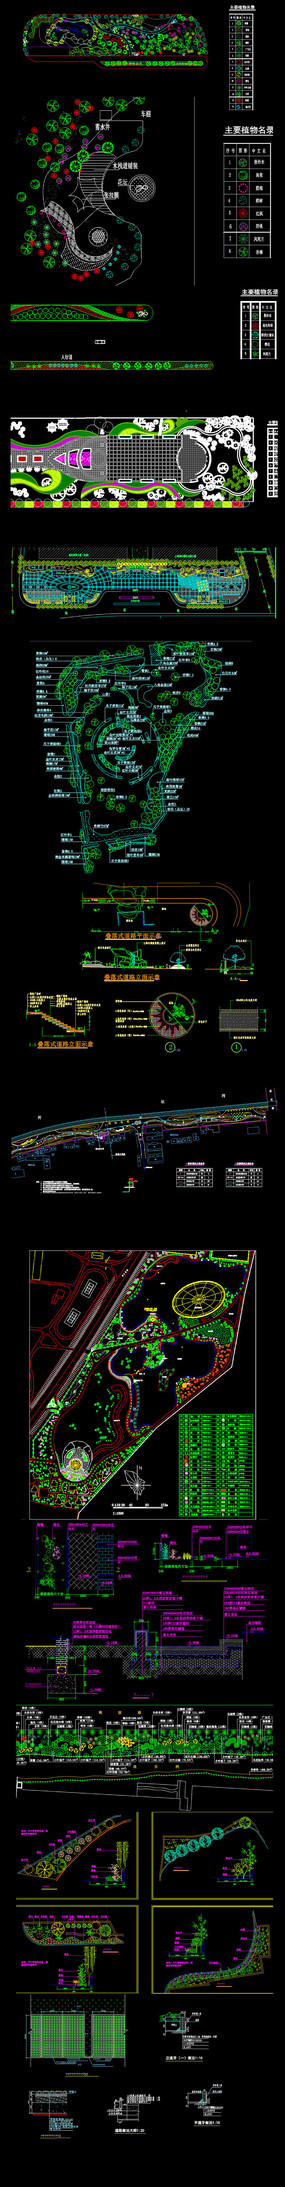 道路绿化CAD图